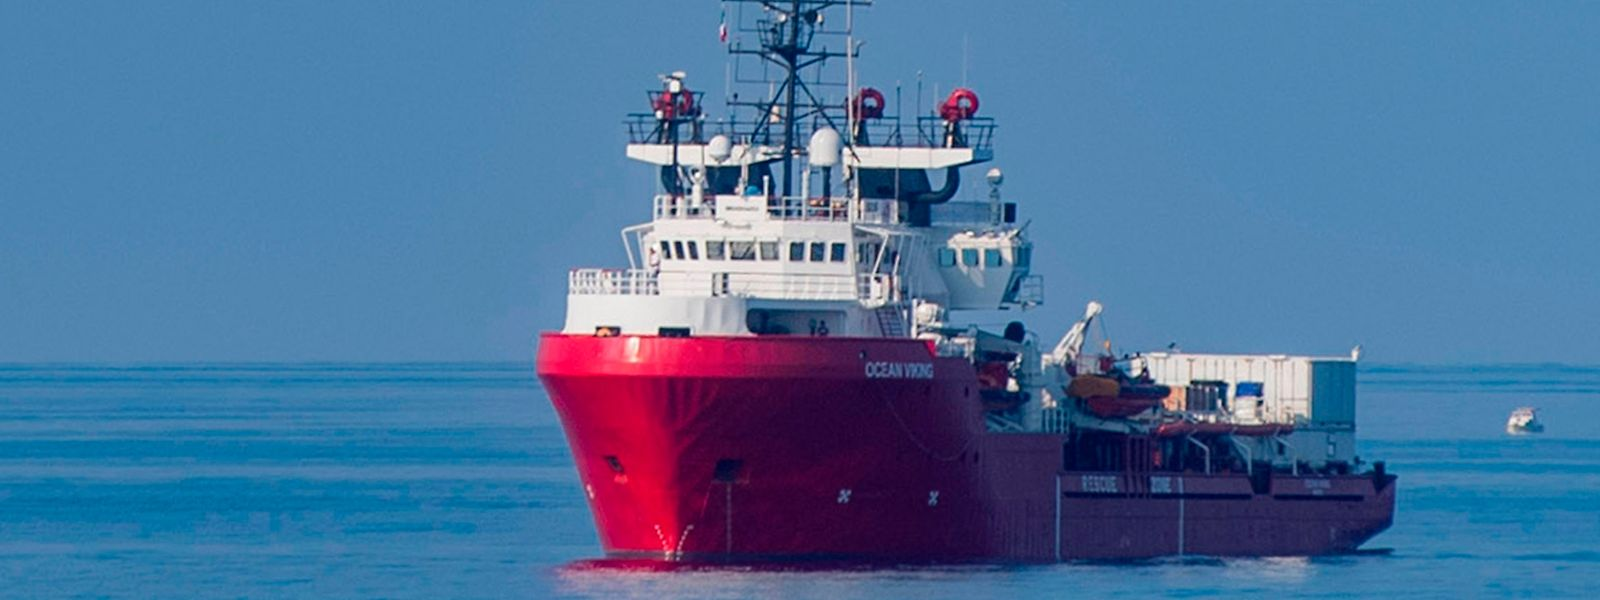 "Das private Rettungsschiff ""Ocean Viking"" (Archivfoto)."